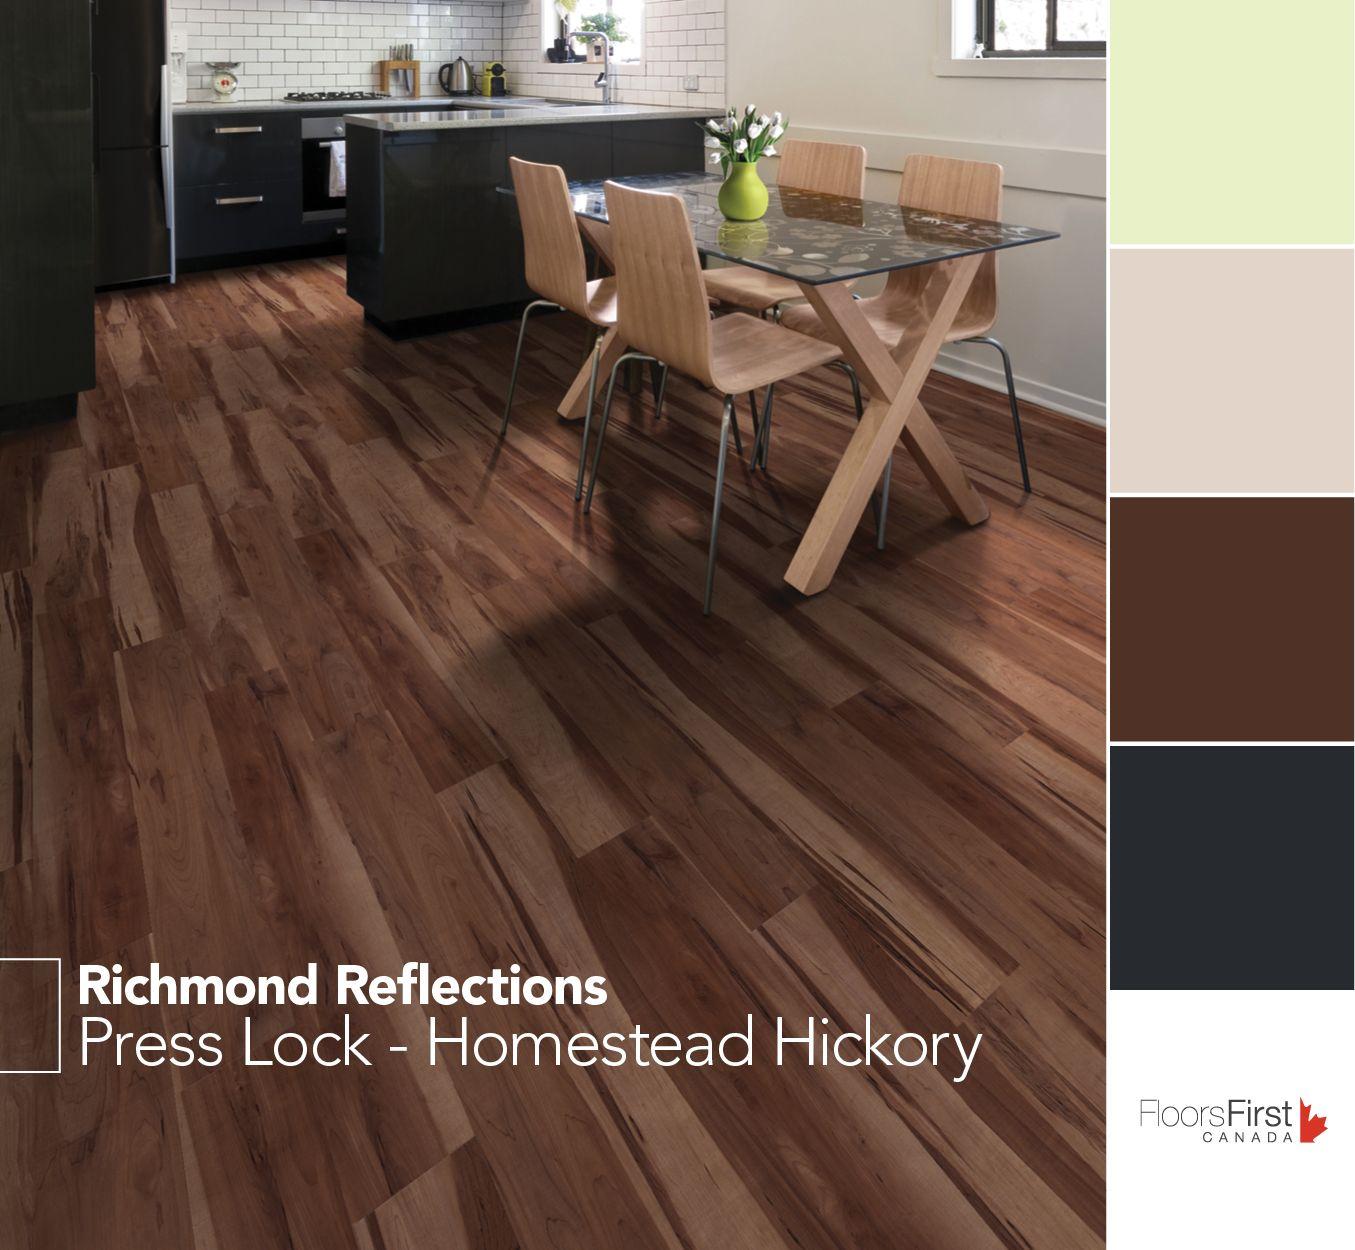 Press Lock From Richmond Reflections Flooring Vinyl Decor Home Condo Kitchen Livingroom Familyroom Bedroom Design Interiordesign Ren Camas